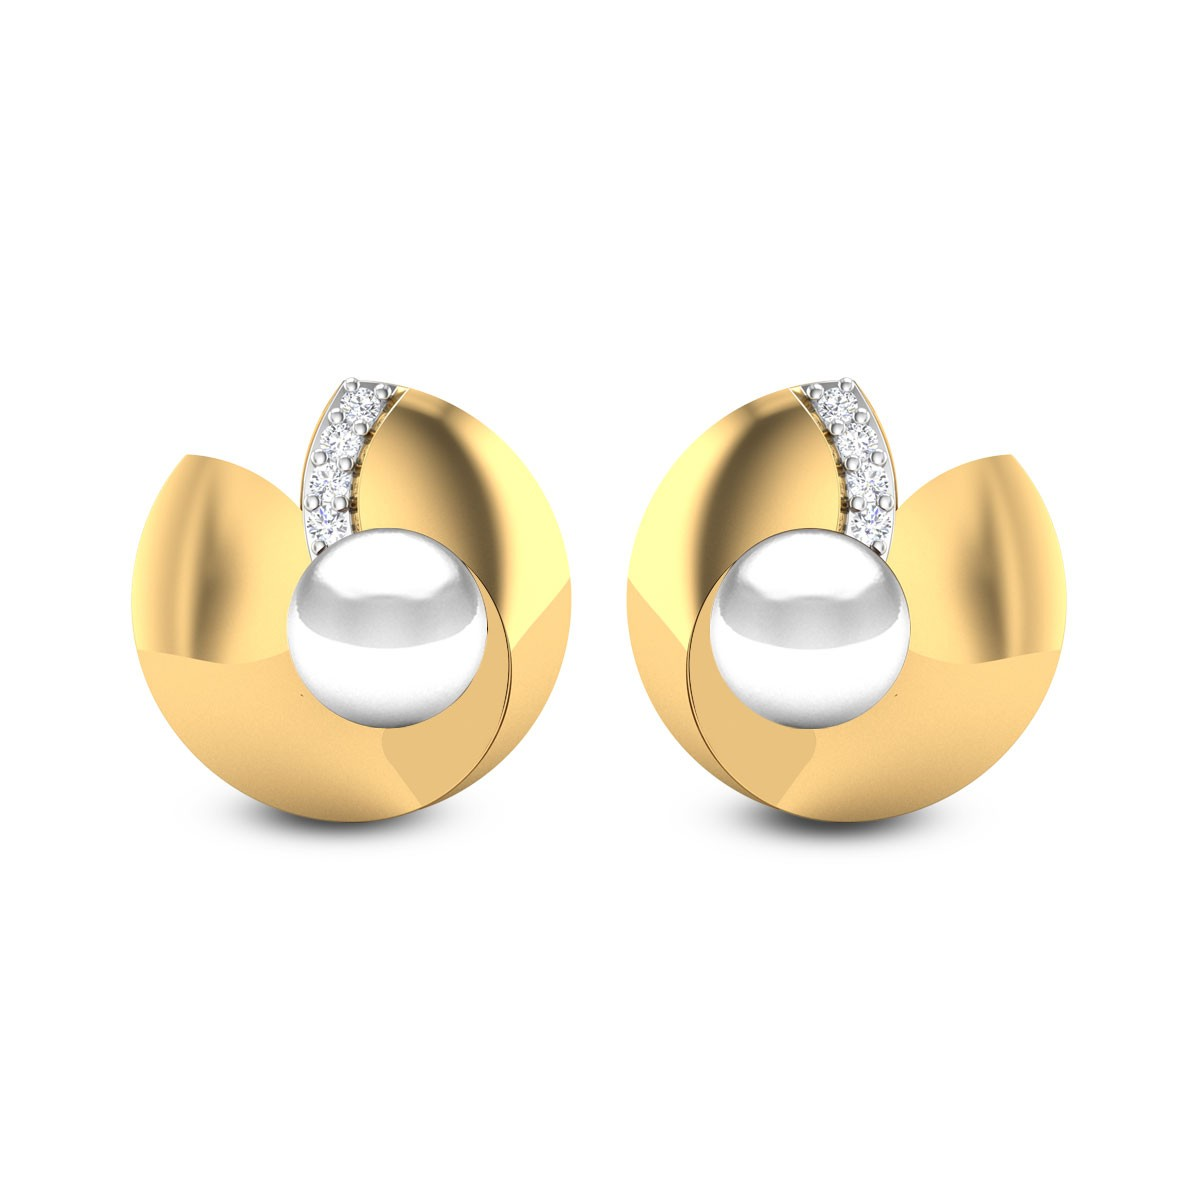 Akshobhya Diamond Stud Earrings